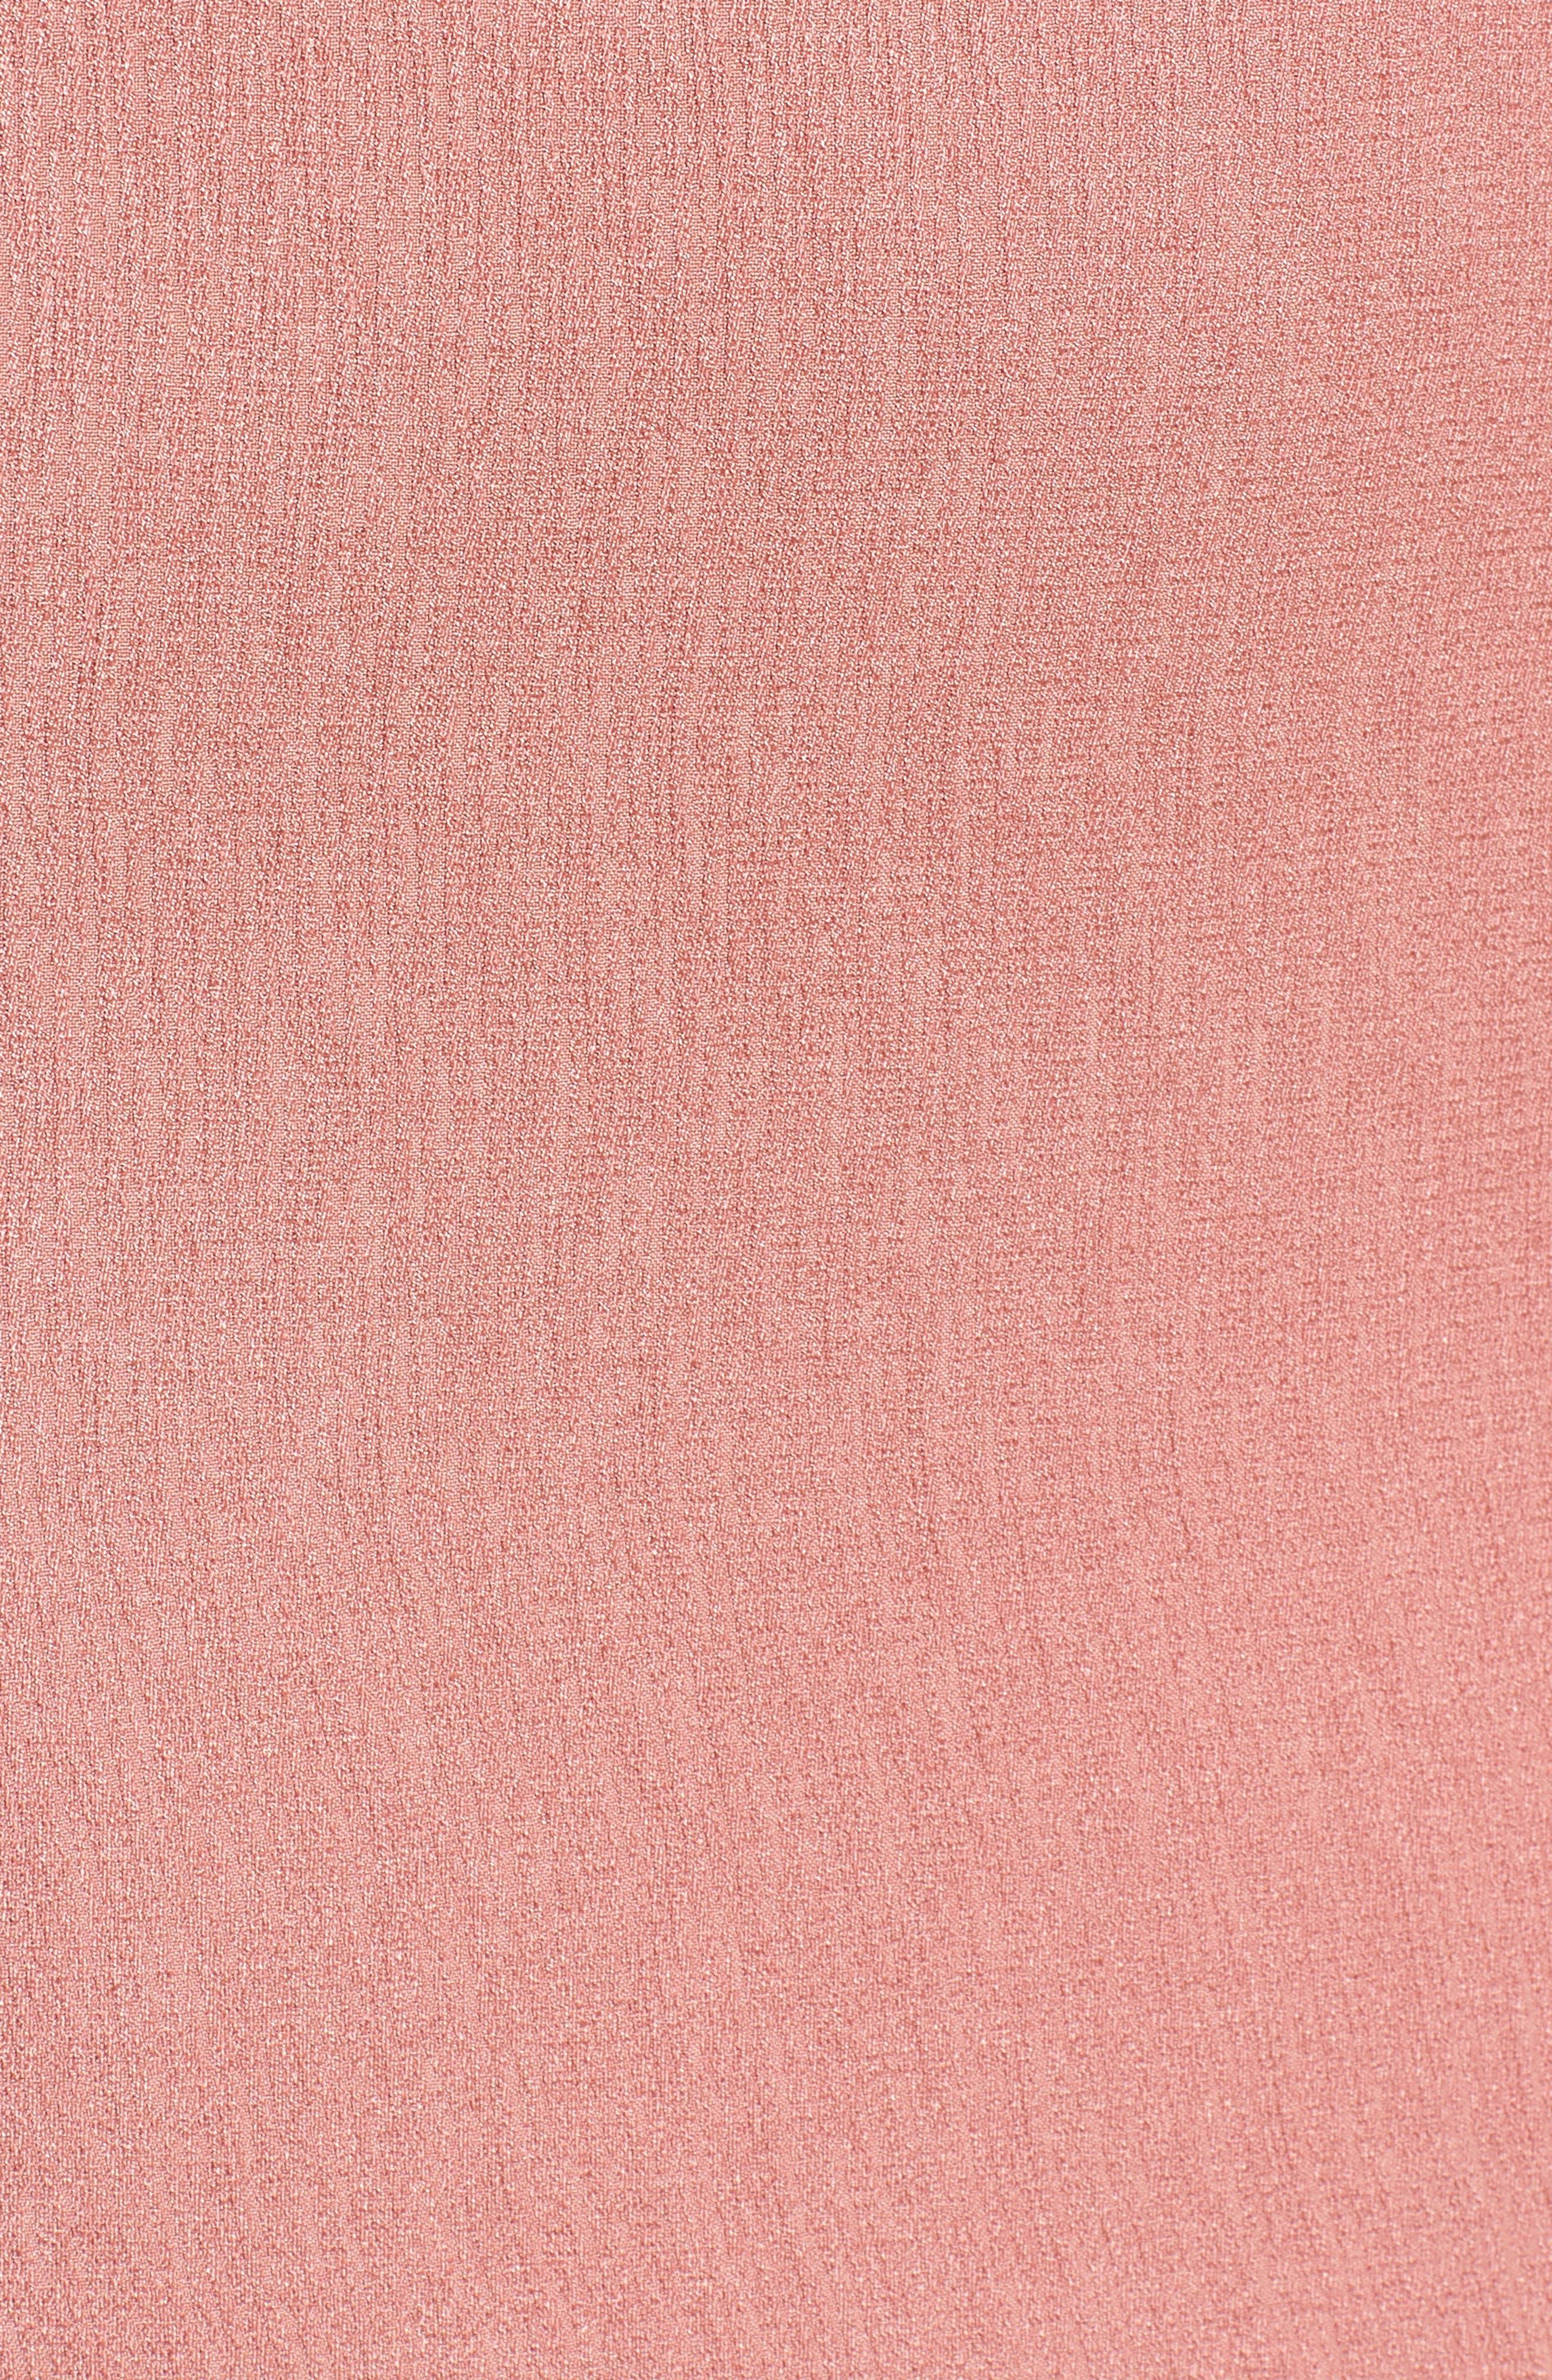 No Reason Off the Shoulder Sheath Dress,                             Alternate thumbnail 5, color,                             650